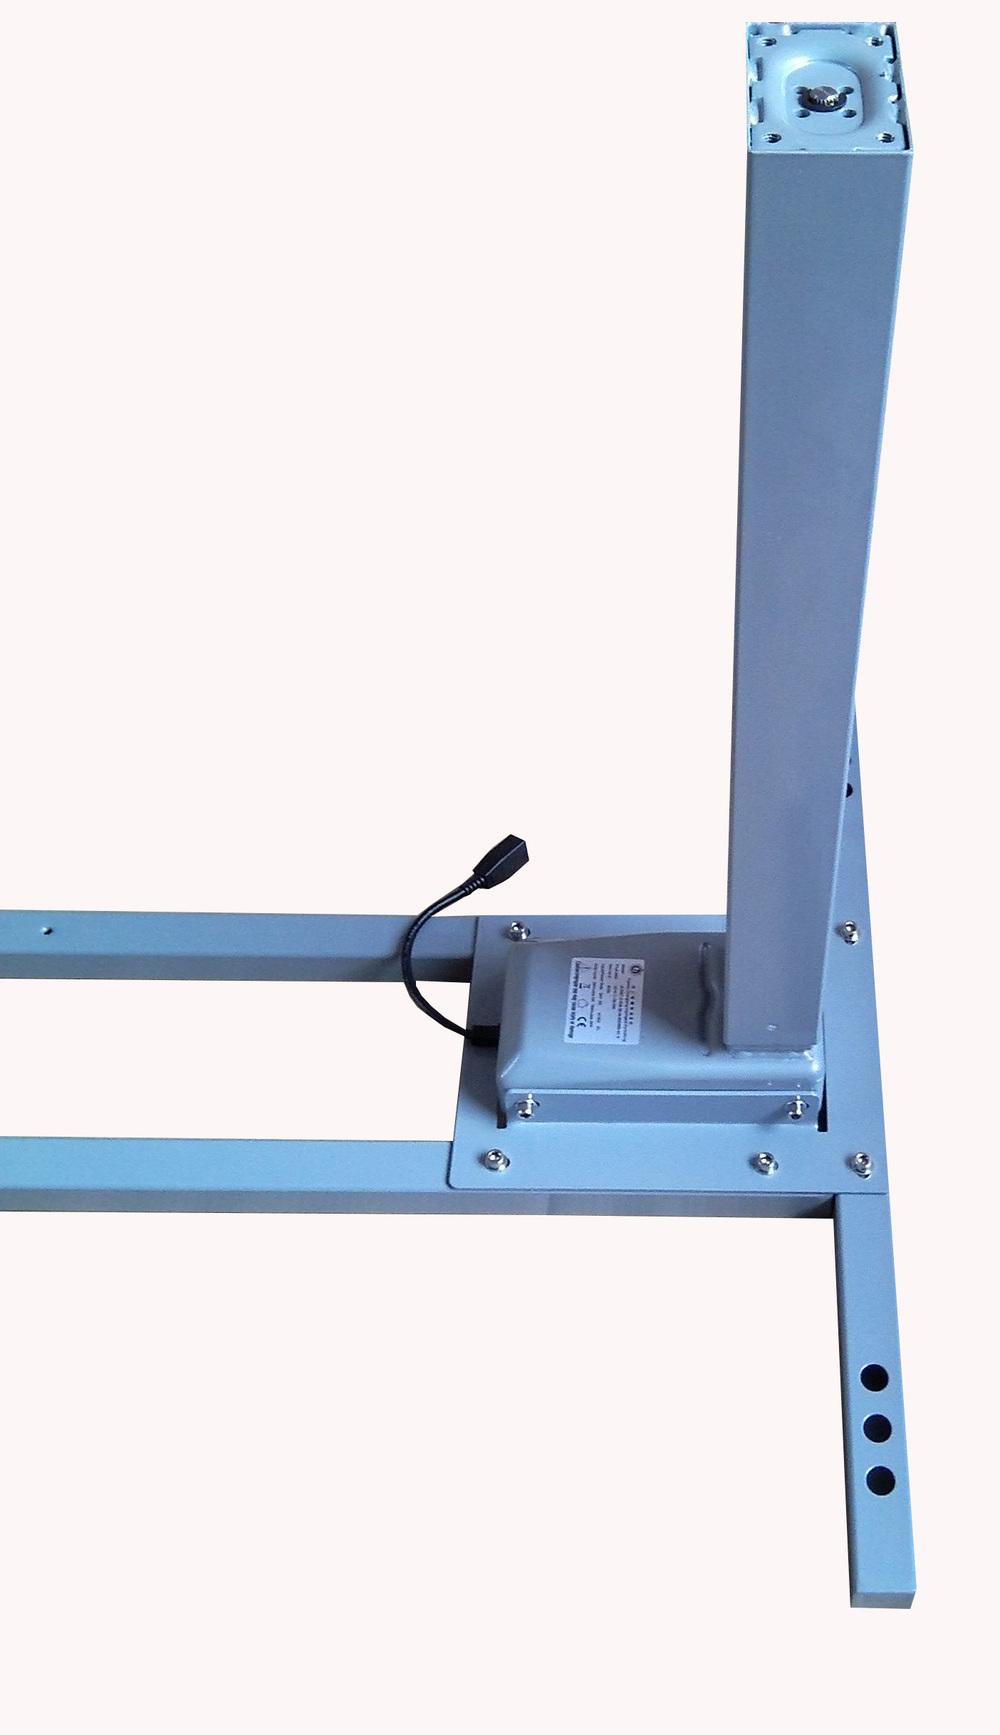 Ctht3 f4200p electric motor height adjustable desk frame for Motorized standing desk legs